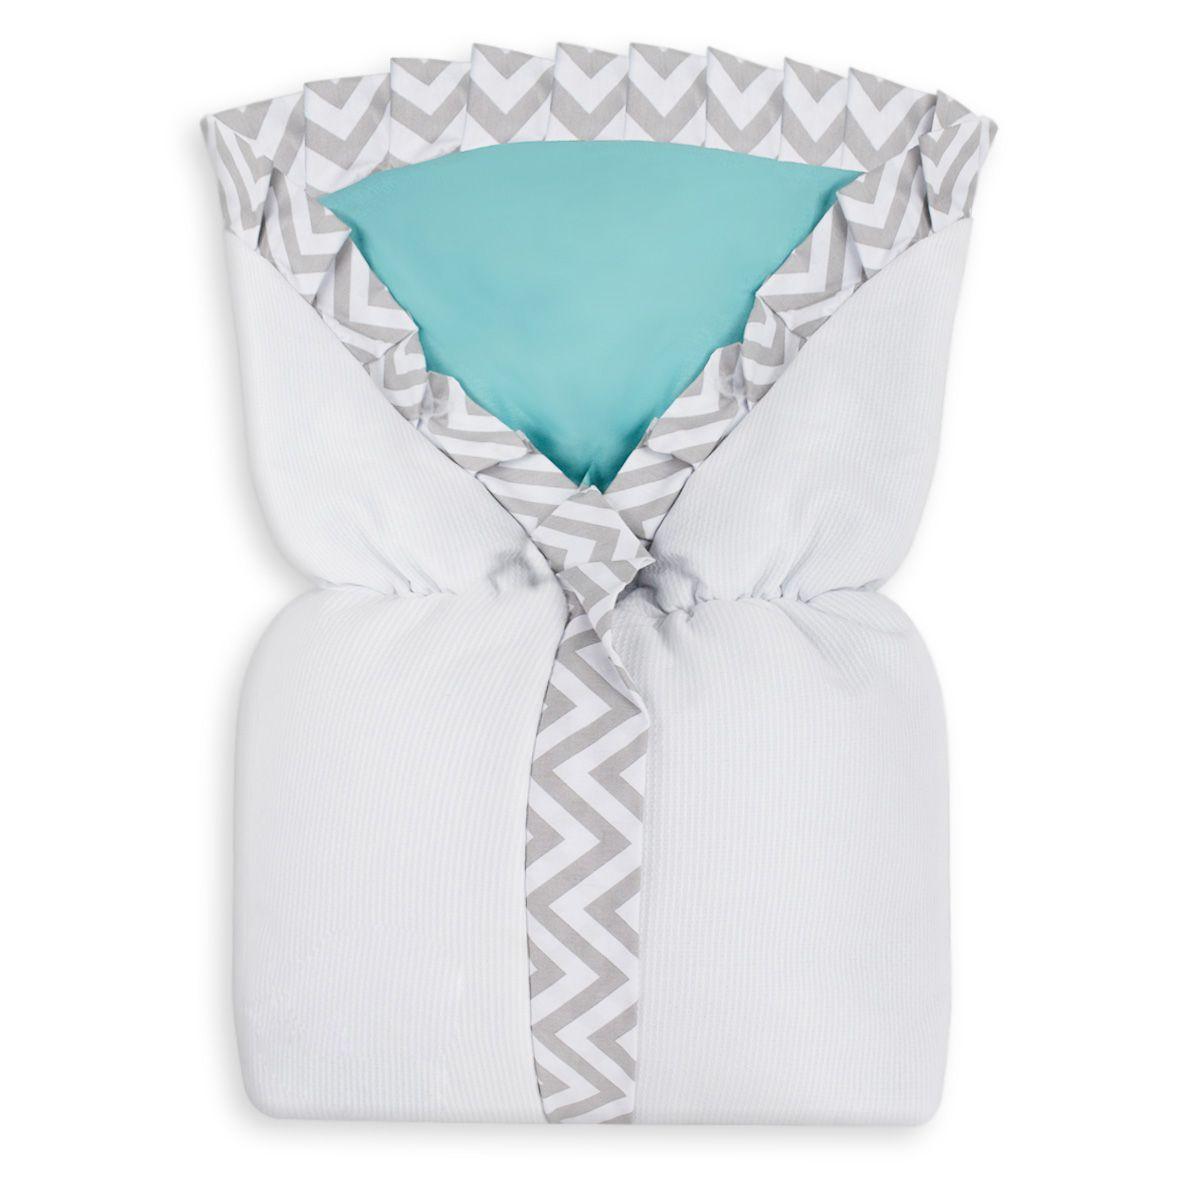 Saco de Bebê 100% Alg. - Chevron Tiffany